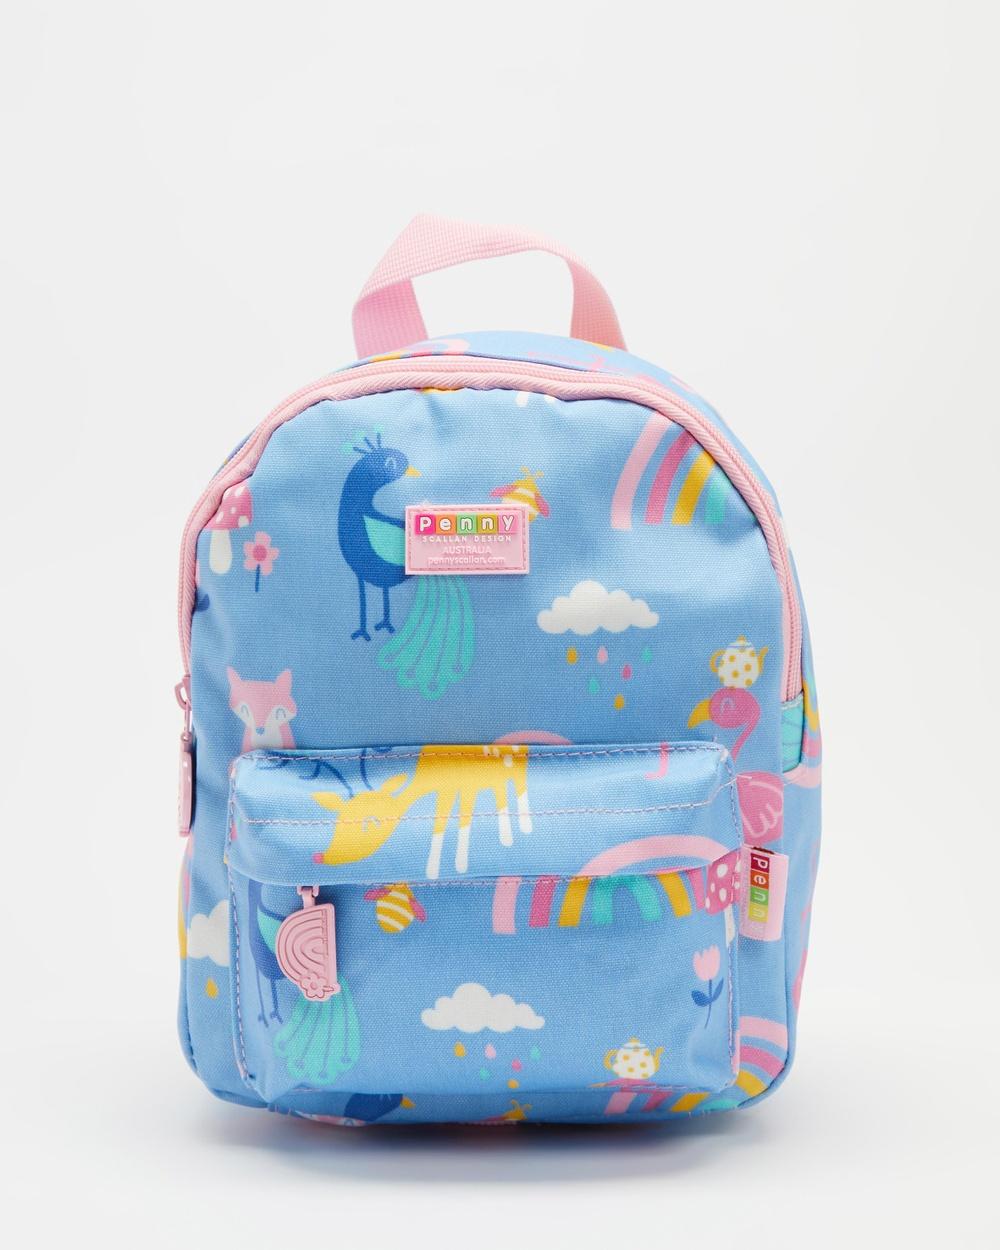 Penny Scallan Mini Backpack School with Rein Backpacks Rainbows